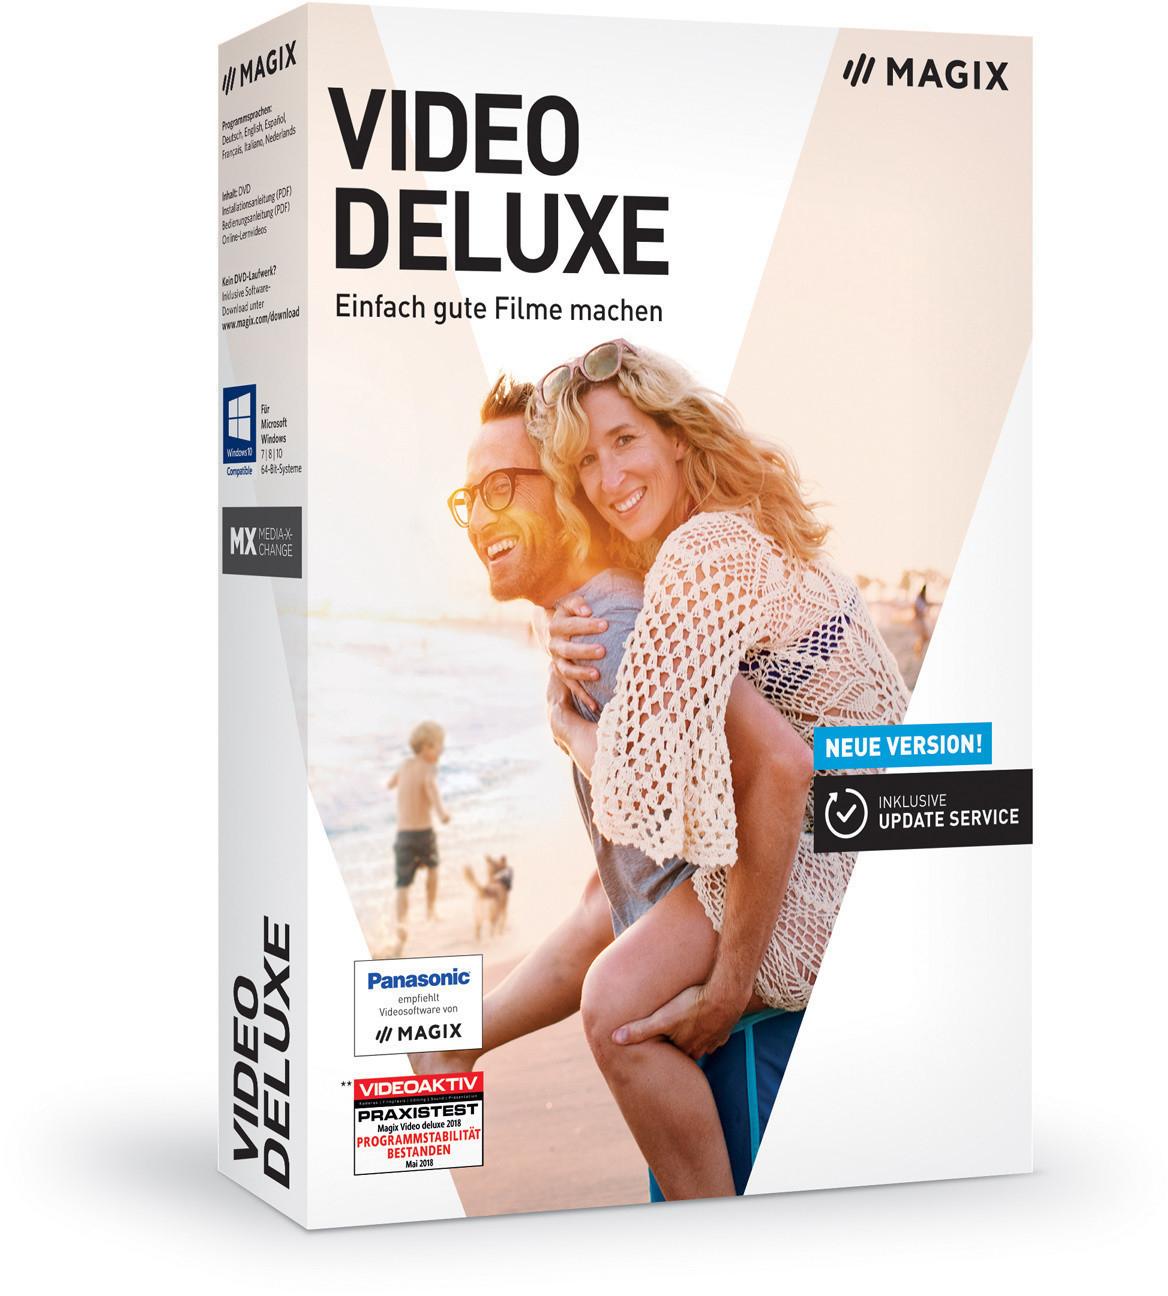 NBB-Blitzdeals: Magix Video Deluxe 2019 - 23,98€ | Scanner Epson WorkForce DS-1630 - 164,99€ | Monolaserdrucker Lexmark B2650dn - 77€